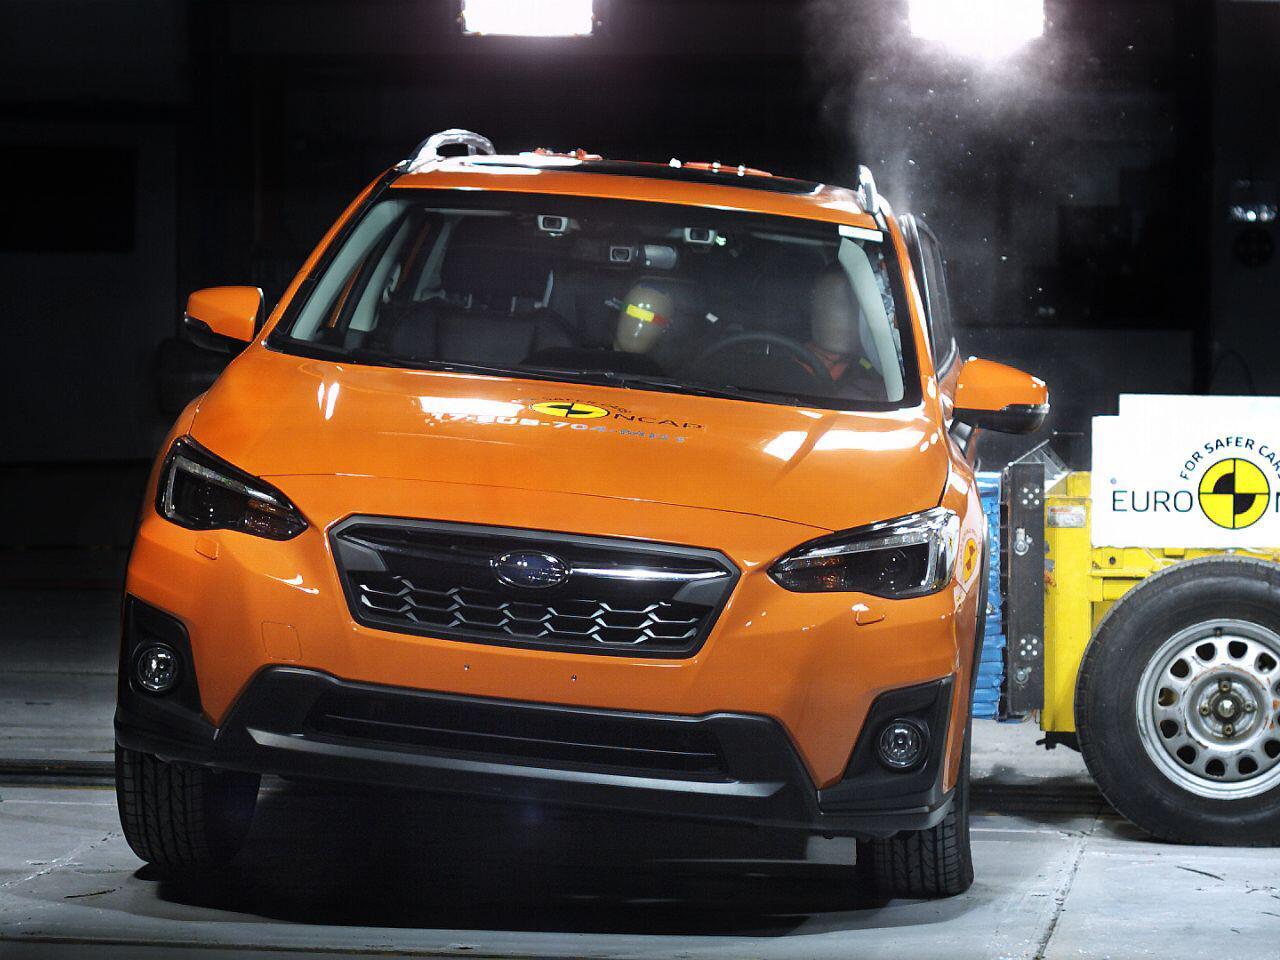 Bild zu Sieger Kompaktklasse: Subaru XV